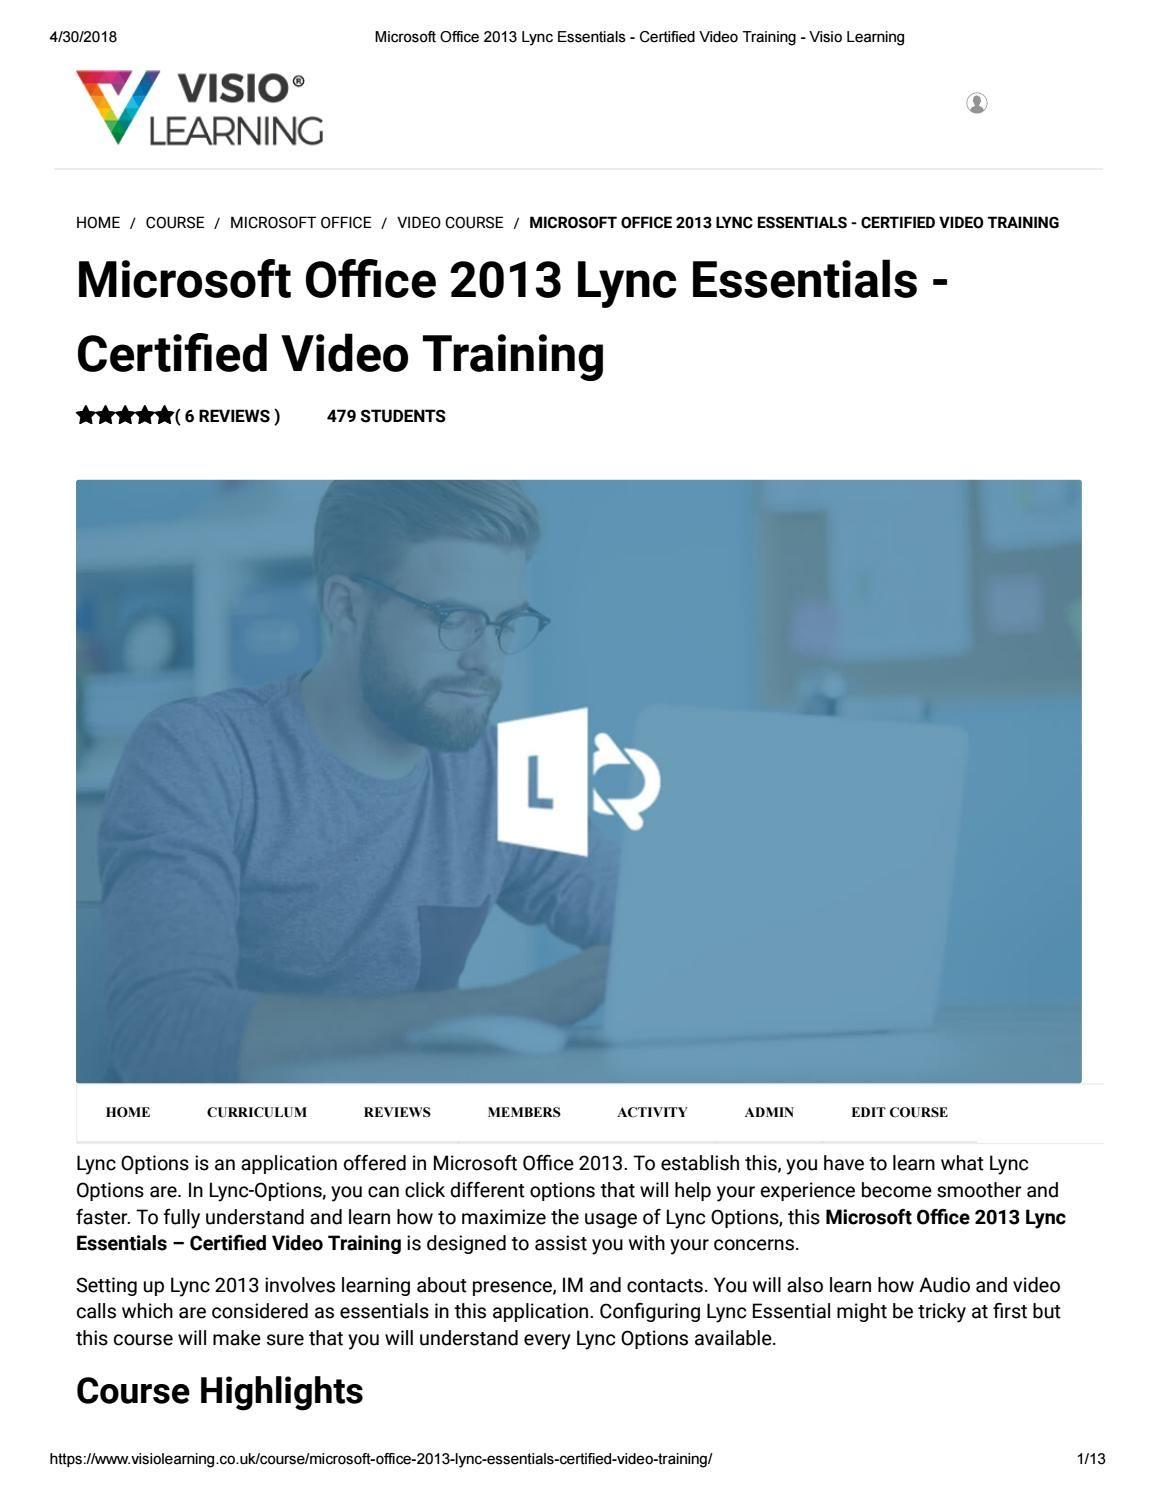 Microsoft Office 2013 Lync Essentials Certified Video Training Visio